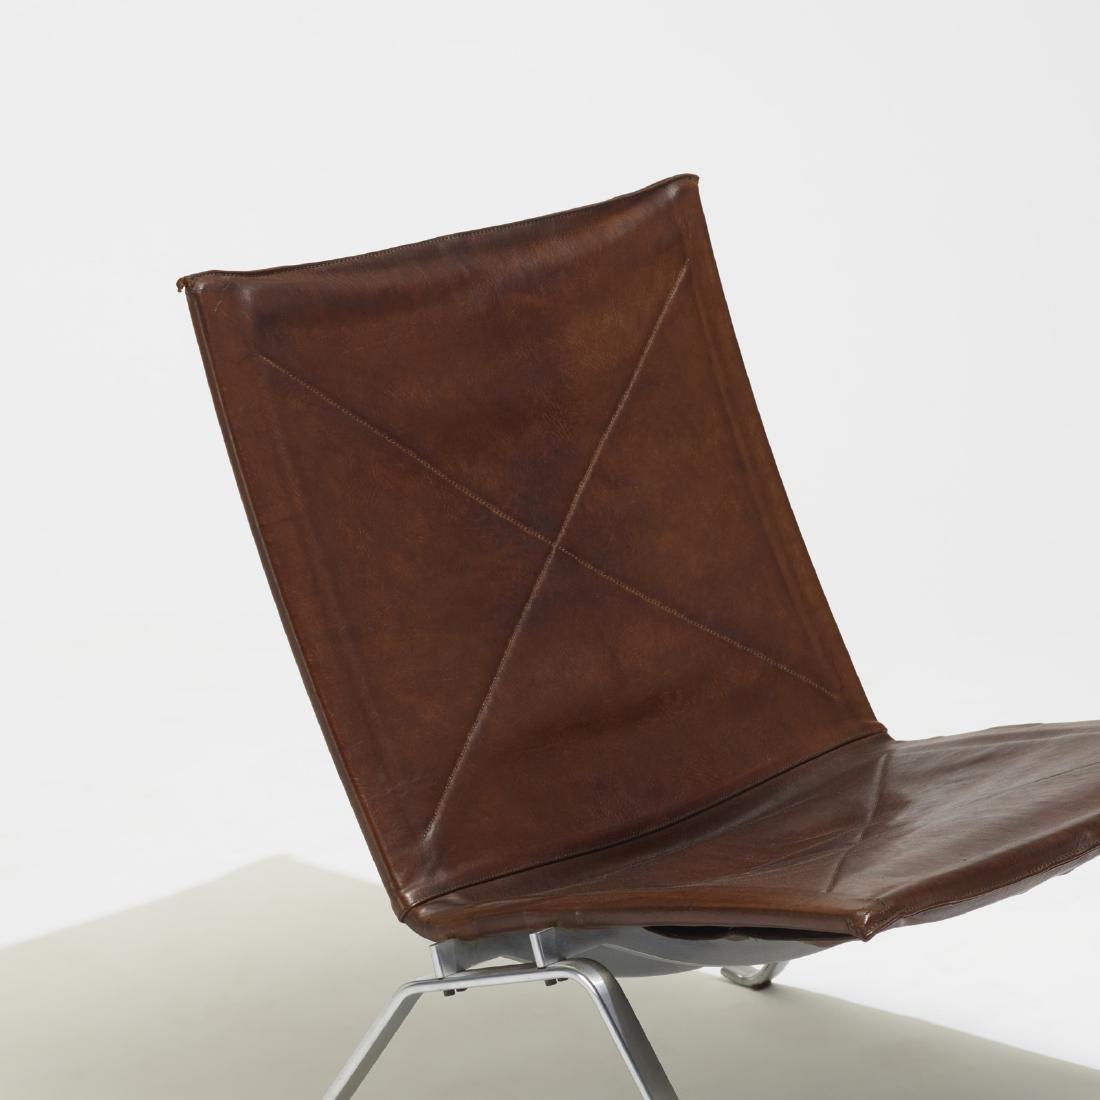 Poul Kjaerholm, PK 22 lounge chairs, pair - 3